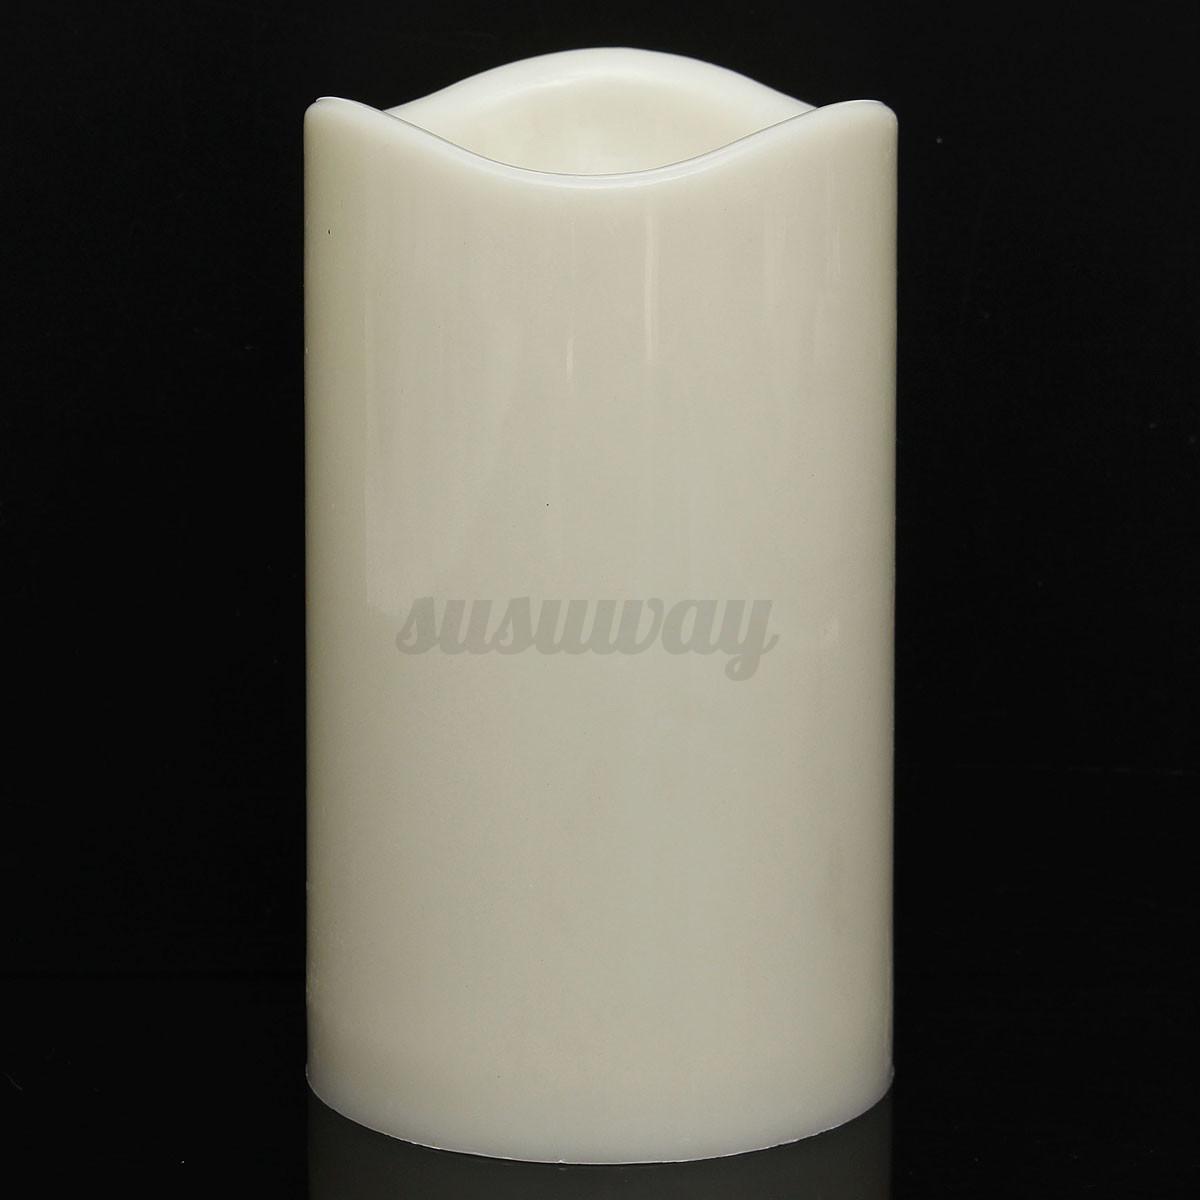 4-Tamano-Lampara-VELA-LED-Candle-Light-Romantica-Sin-llama-LED-Hogar-Decoracion